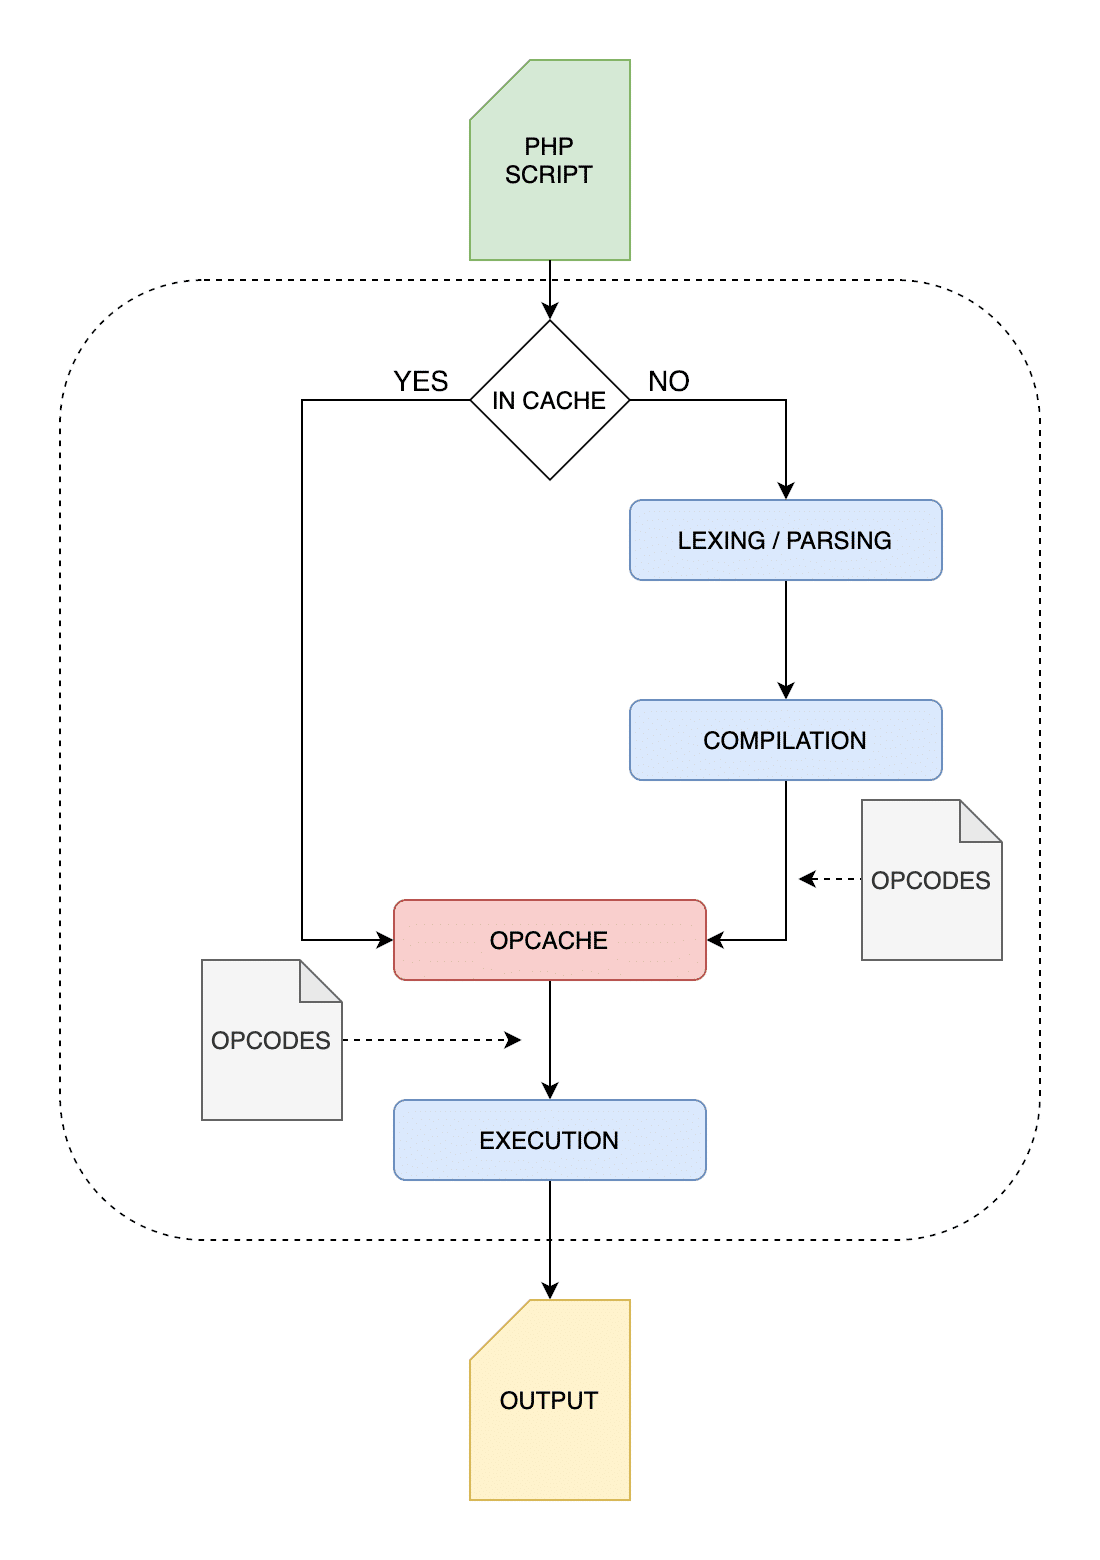 OPcacheを有効にしたPHP実行プロセス